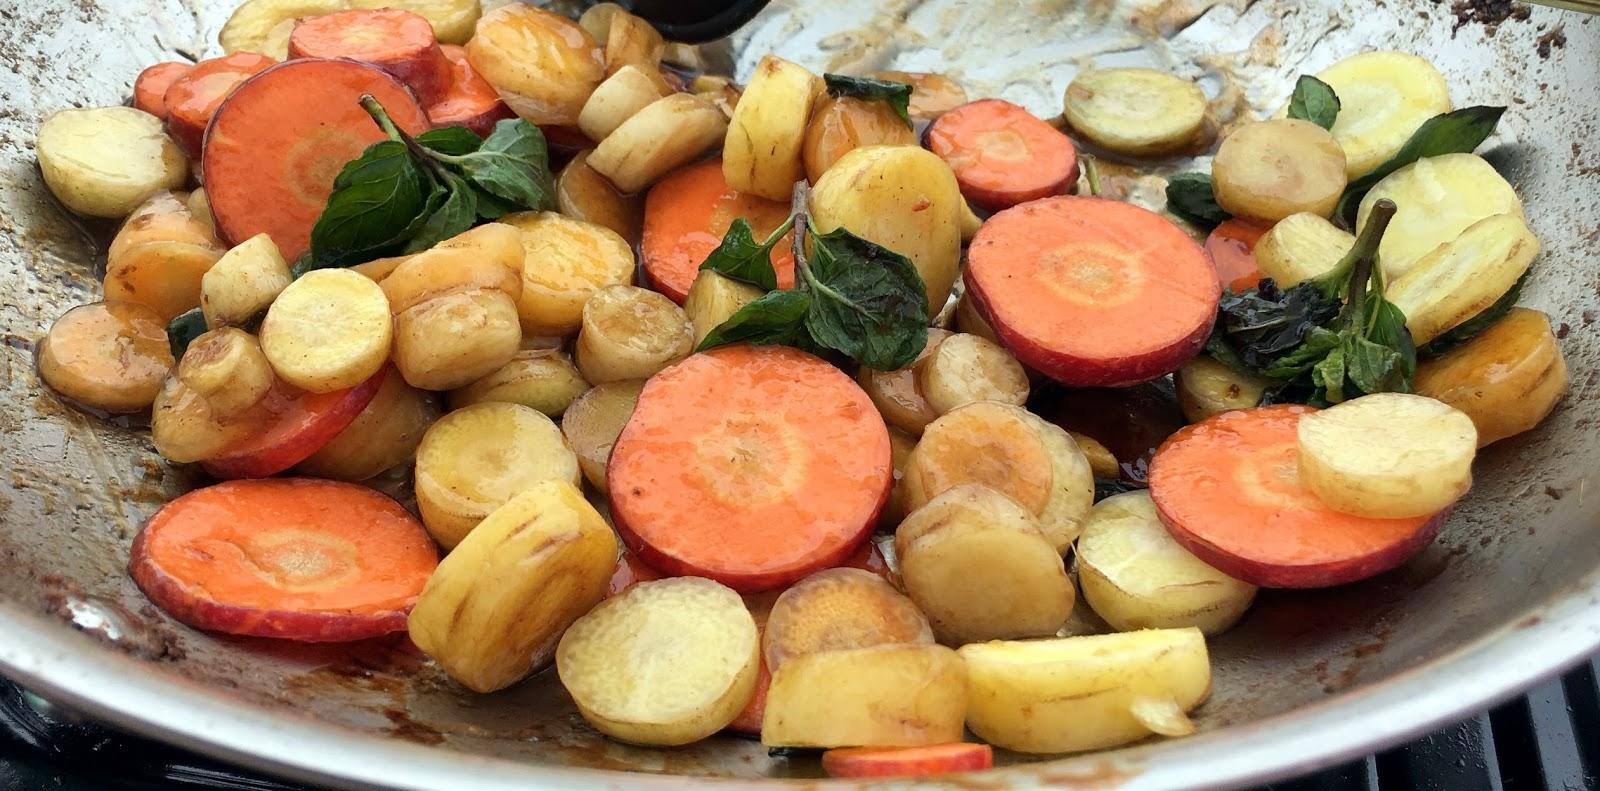 Pomegranate-Balsamic-Glazed Carrots Recipe — Dishmaps